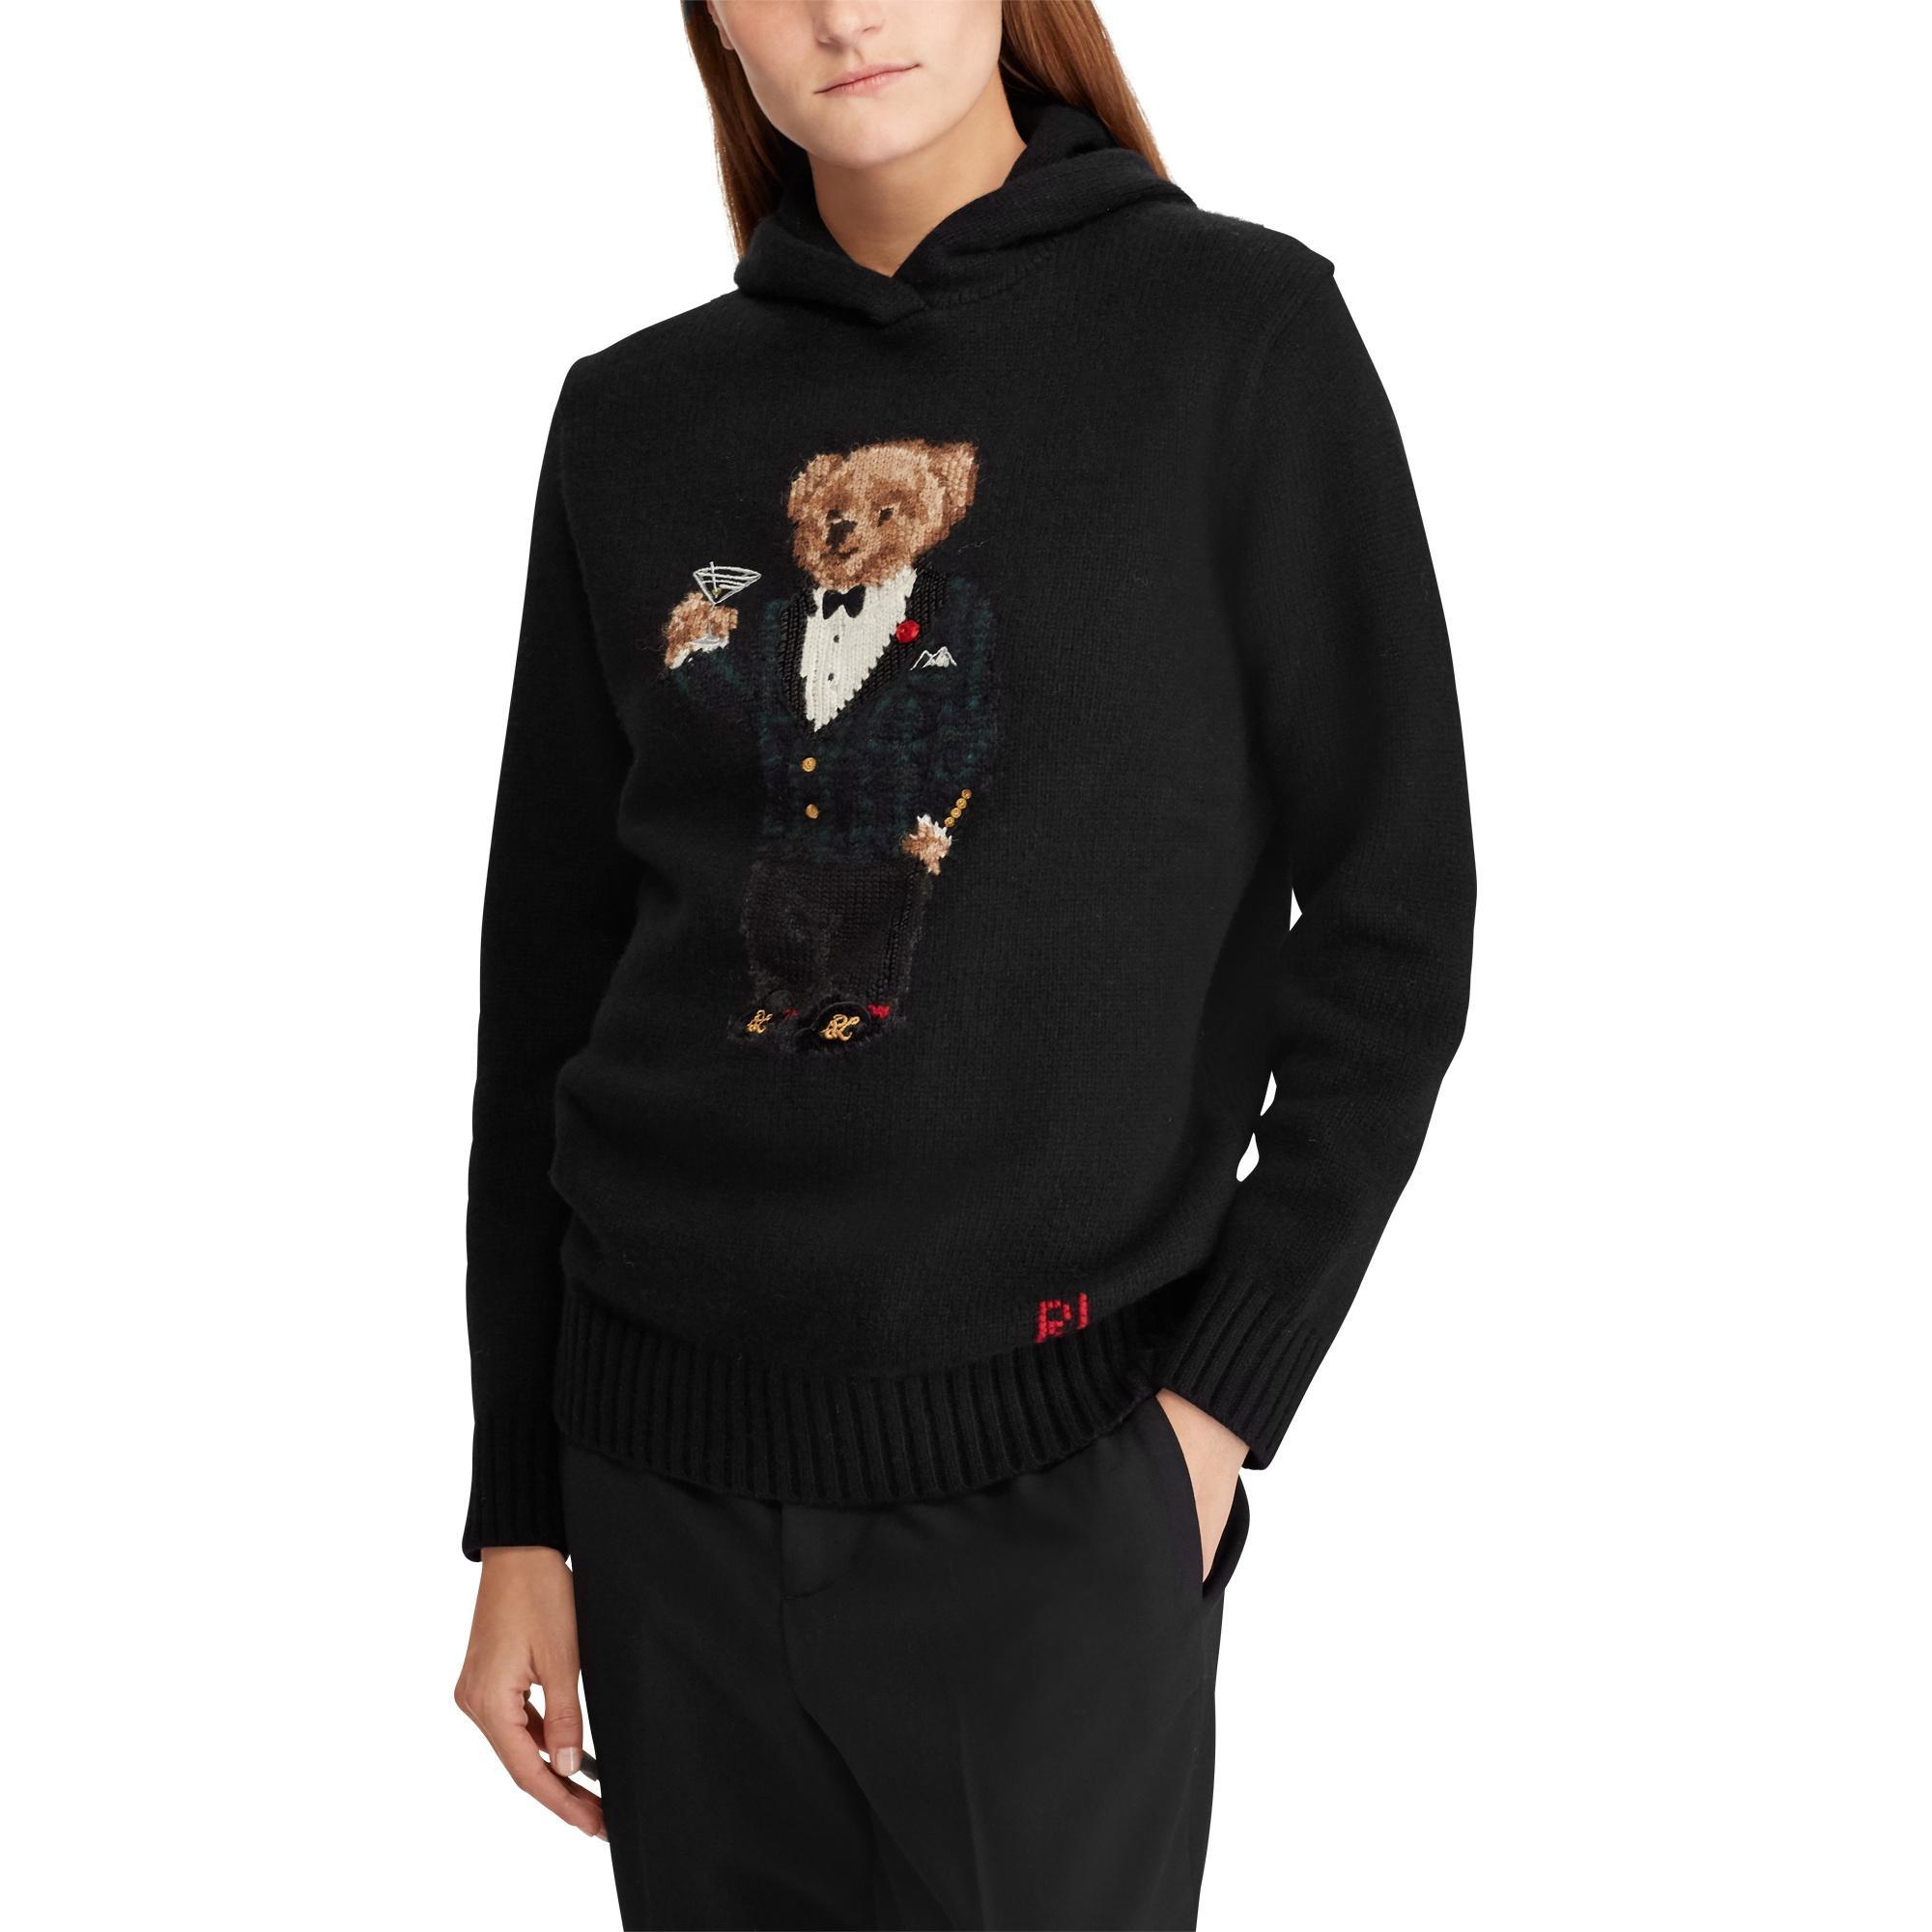 61a898c0 Polo Ralph Lauren Polo Bear Wool-blend Hoodie in Black - Lyst